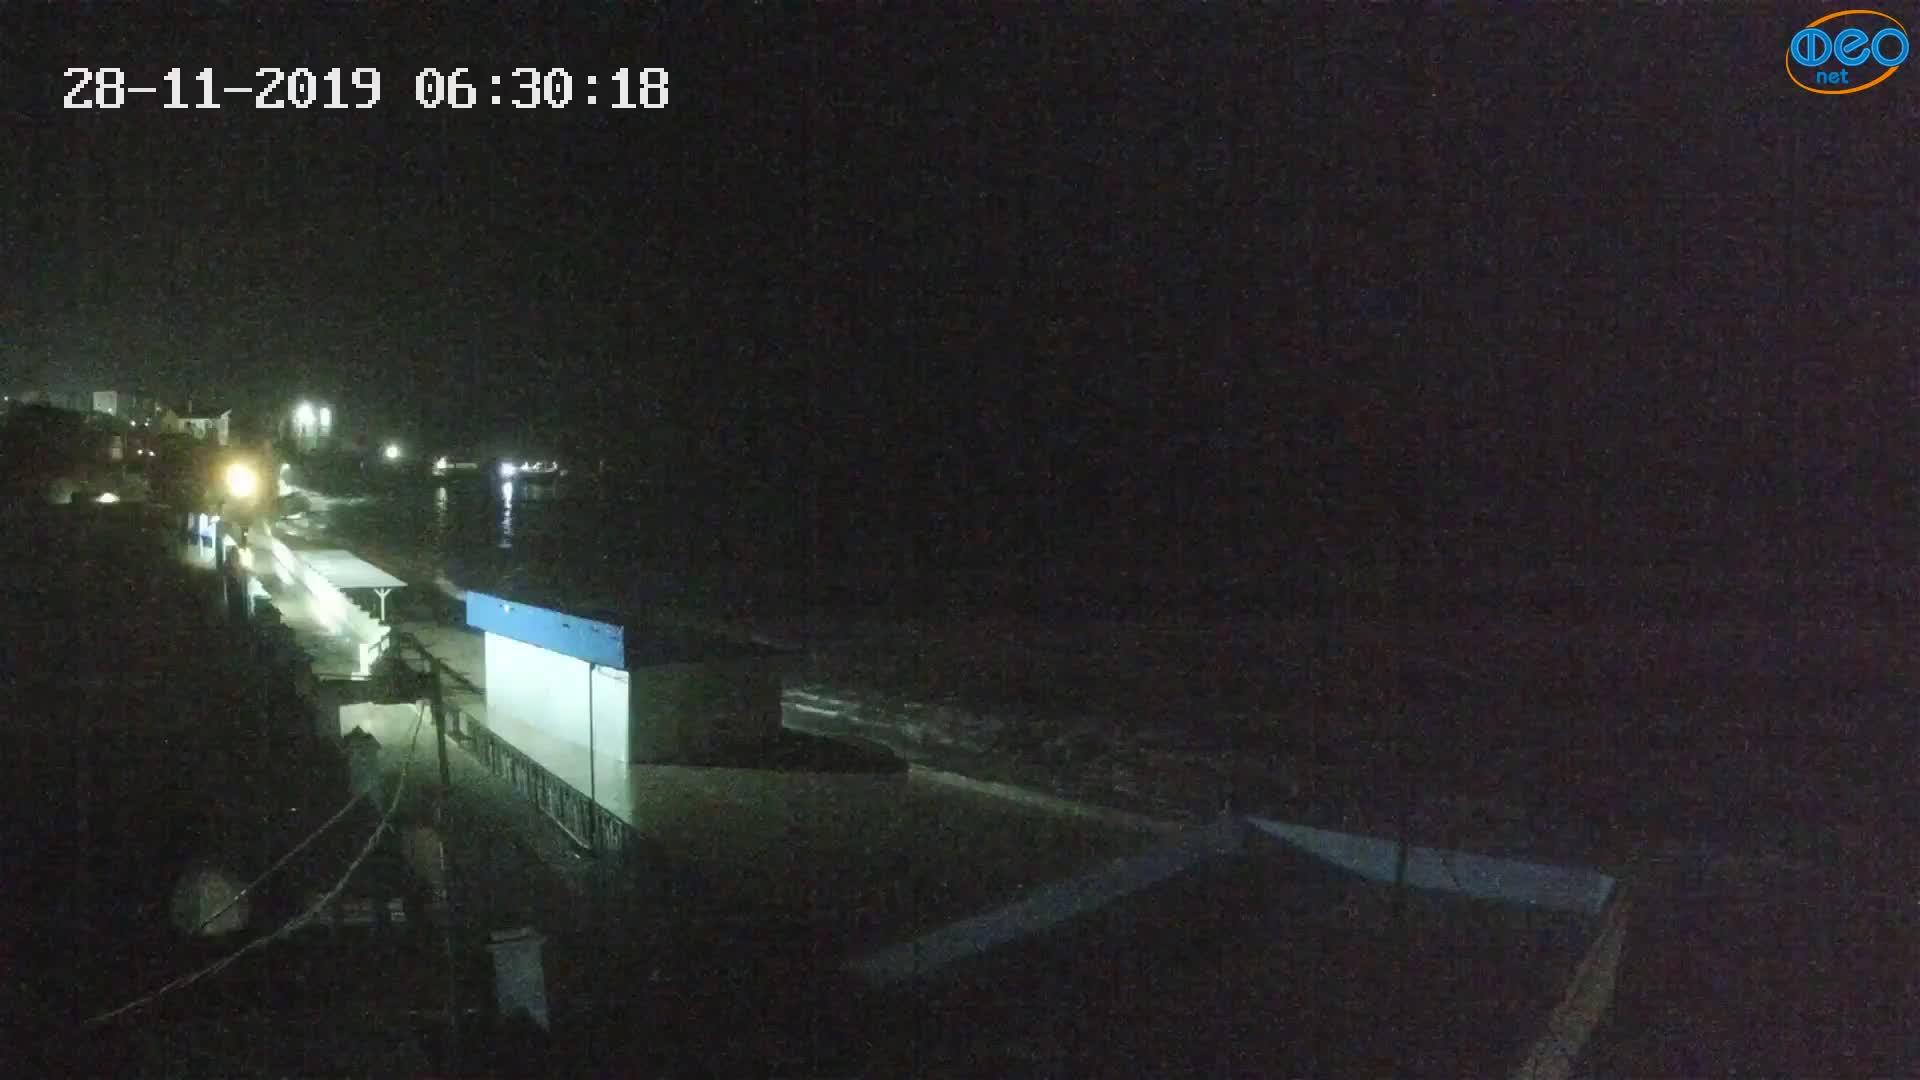 Веб-камеры Феодосии, Орджоникидзе - набережная - вид на Васюковку, 2019-11-28 06:30:38